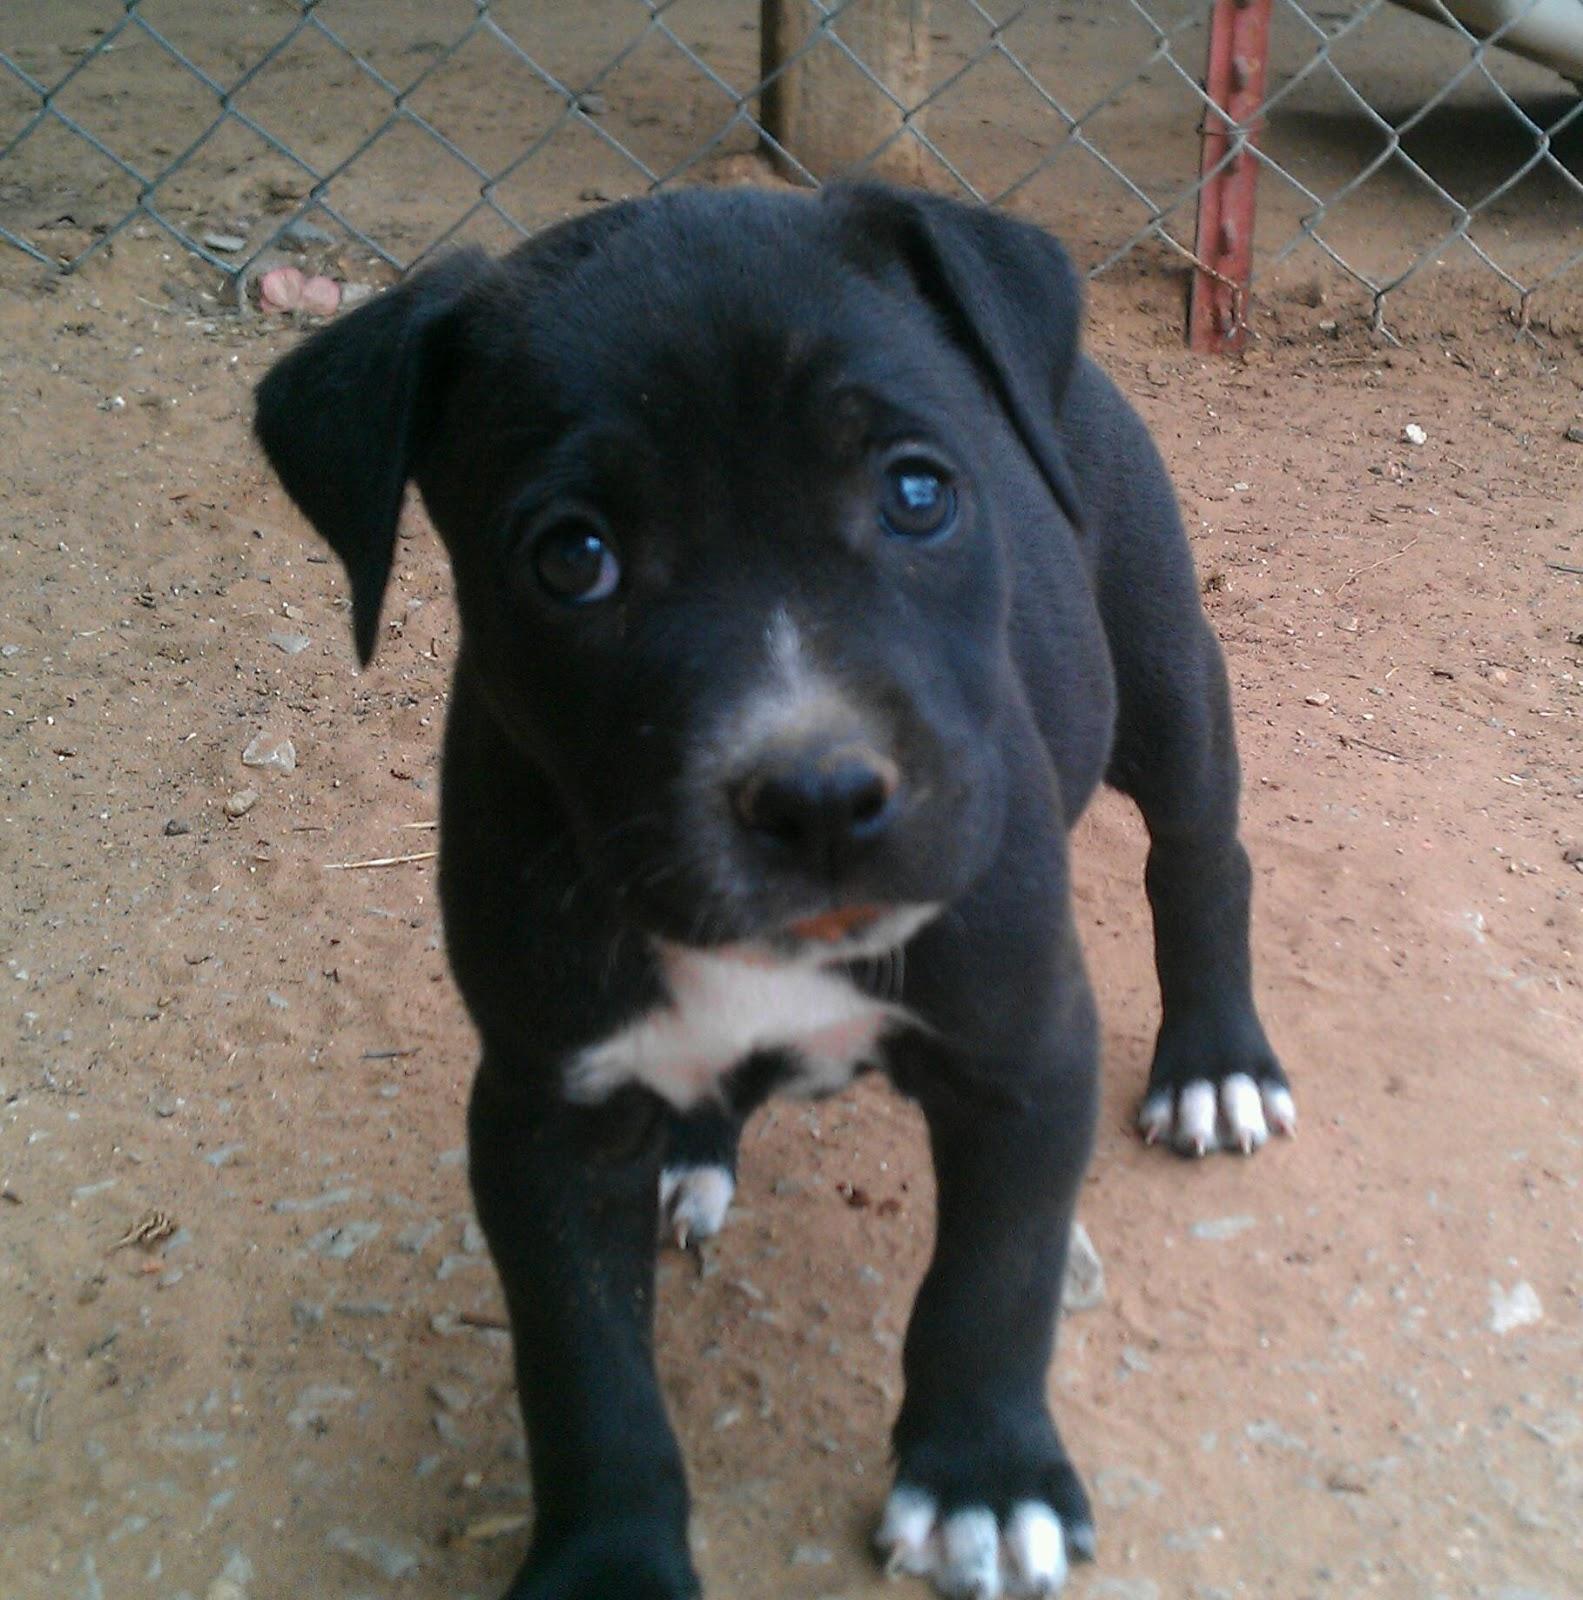 Black And White Pitbull Puppy | www.imgkid.com - The Image ...